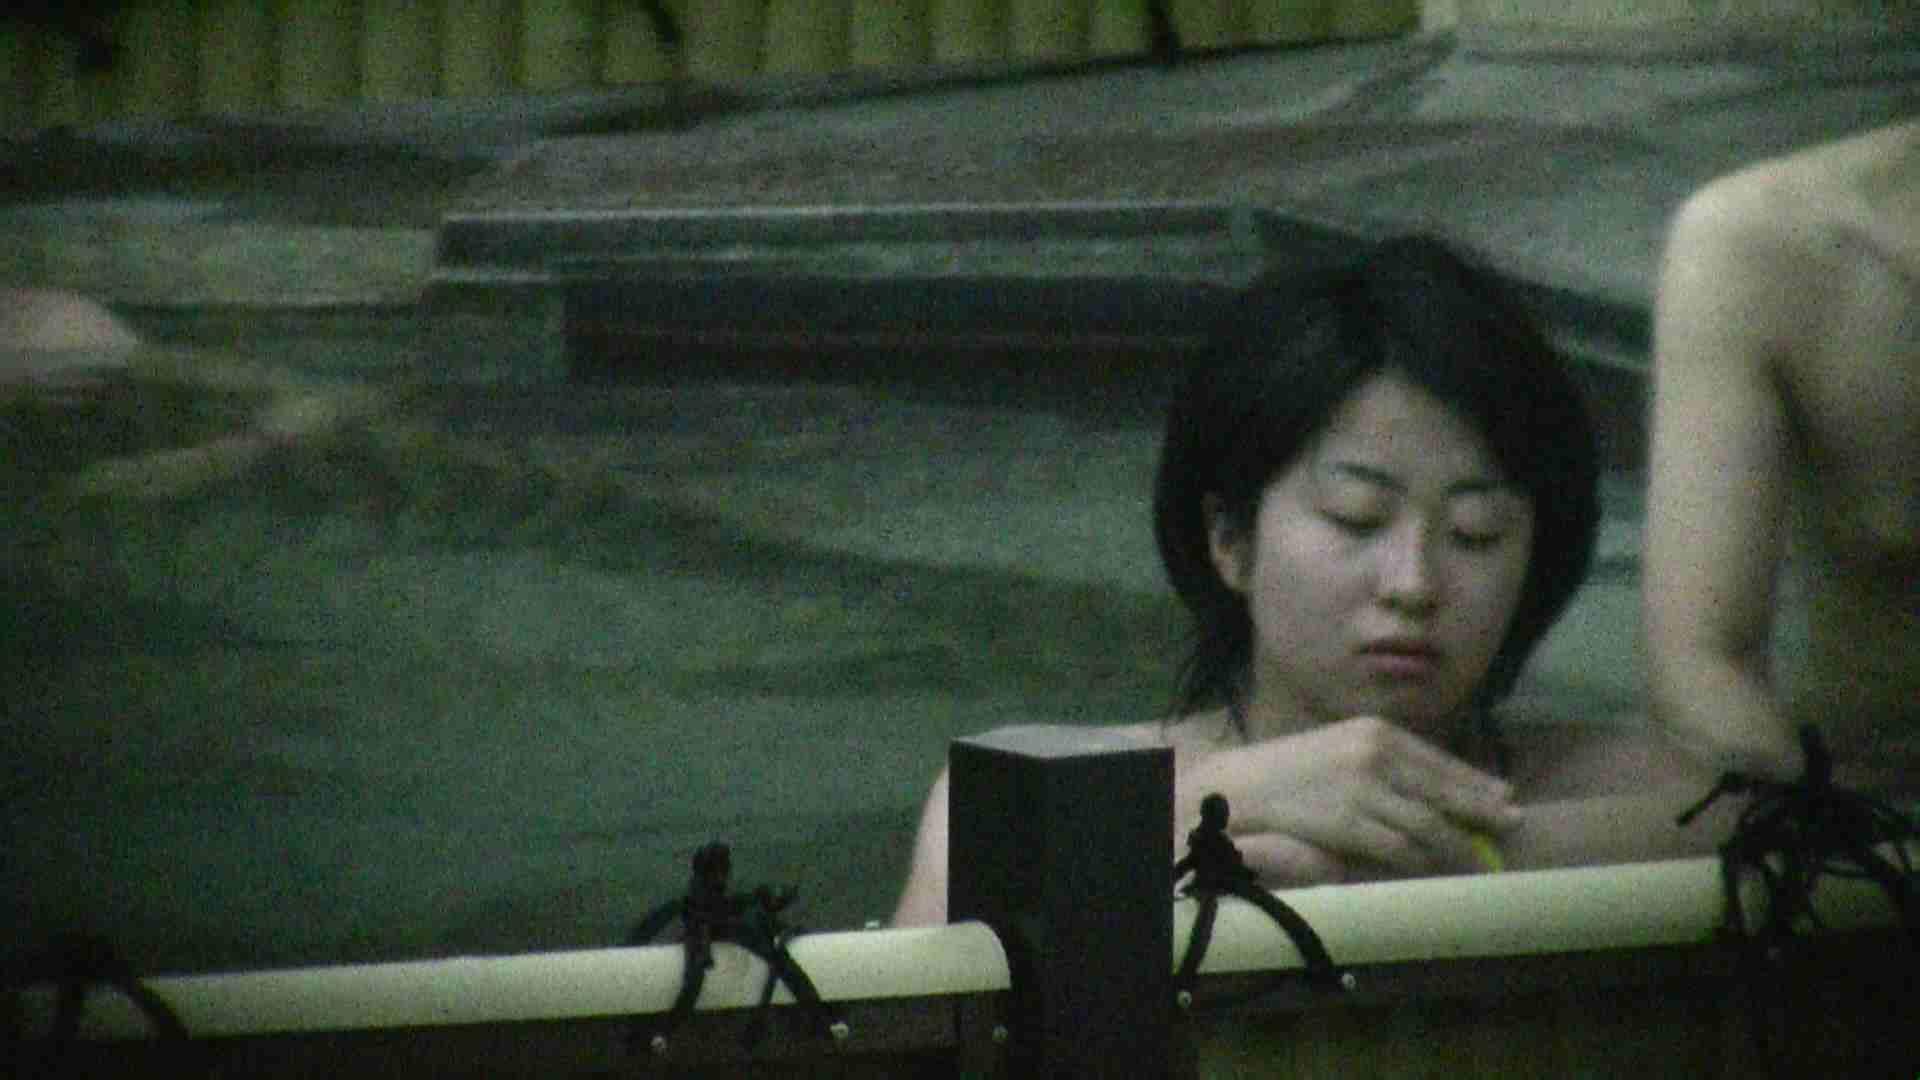 Aquaな露天風呂Vol.112 0 | 0  68連発 49